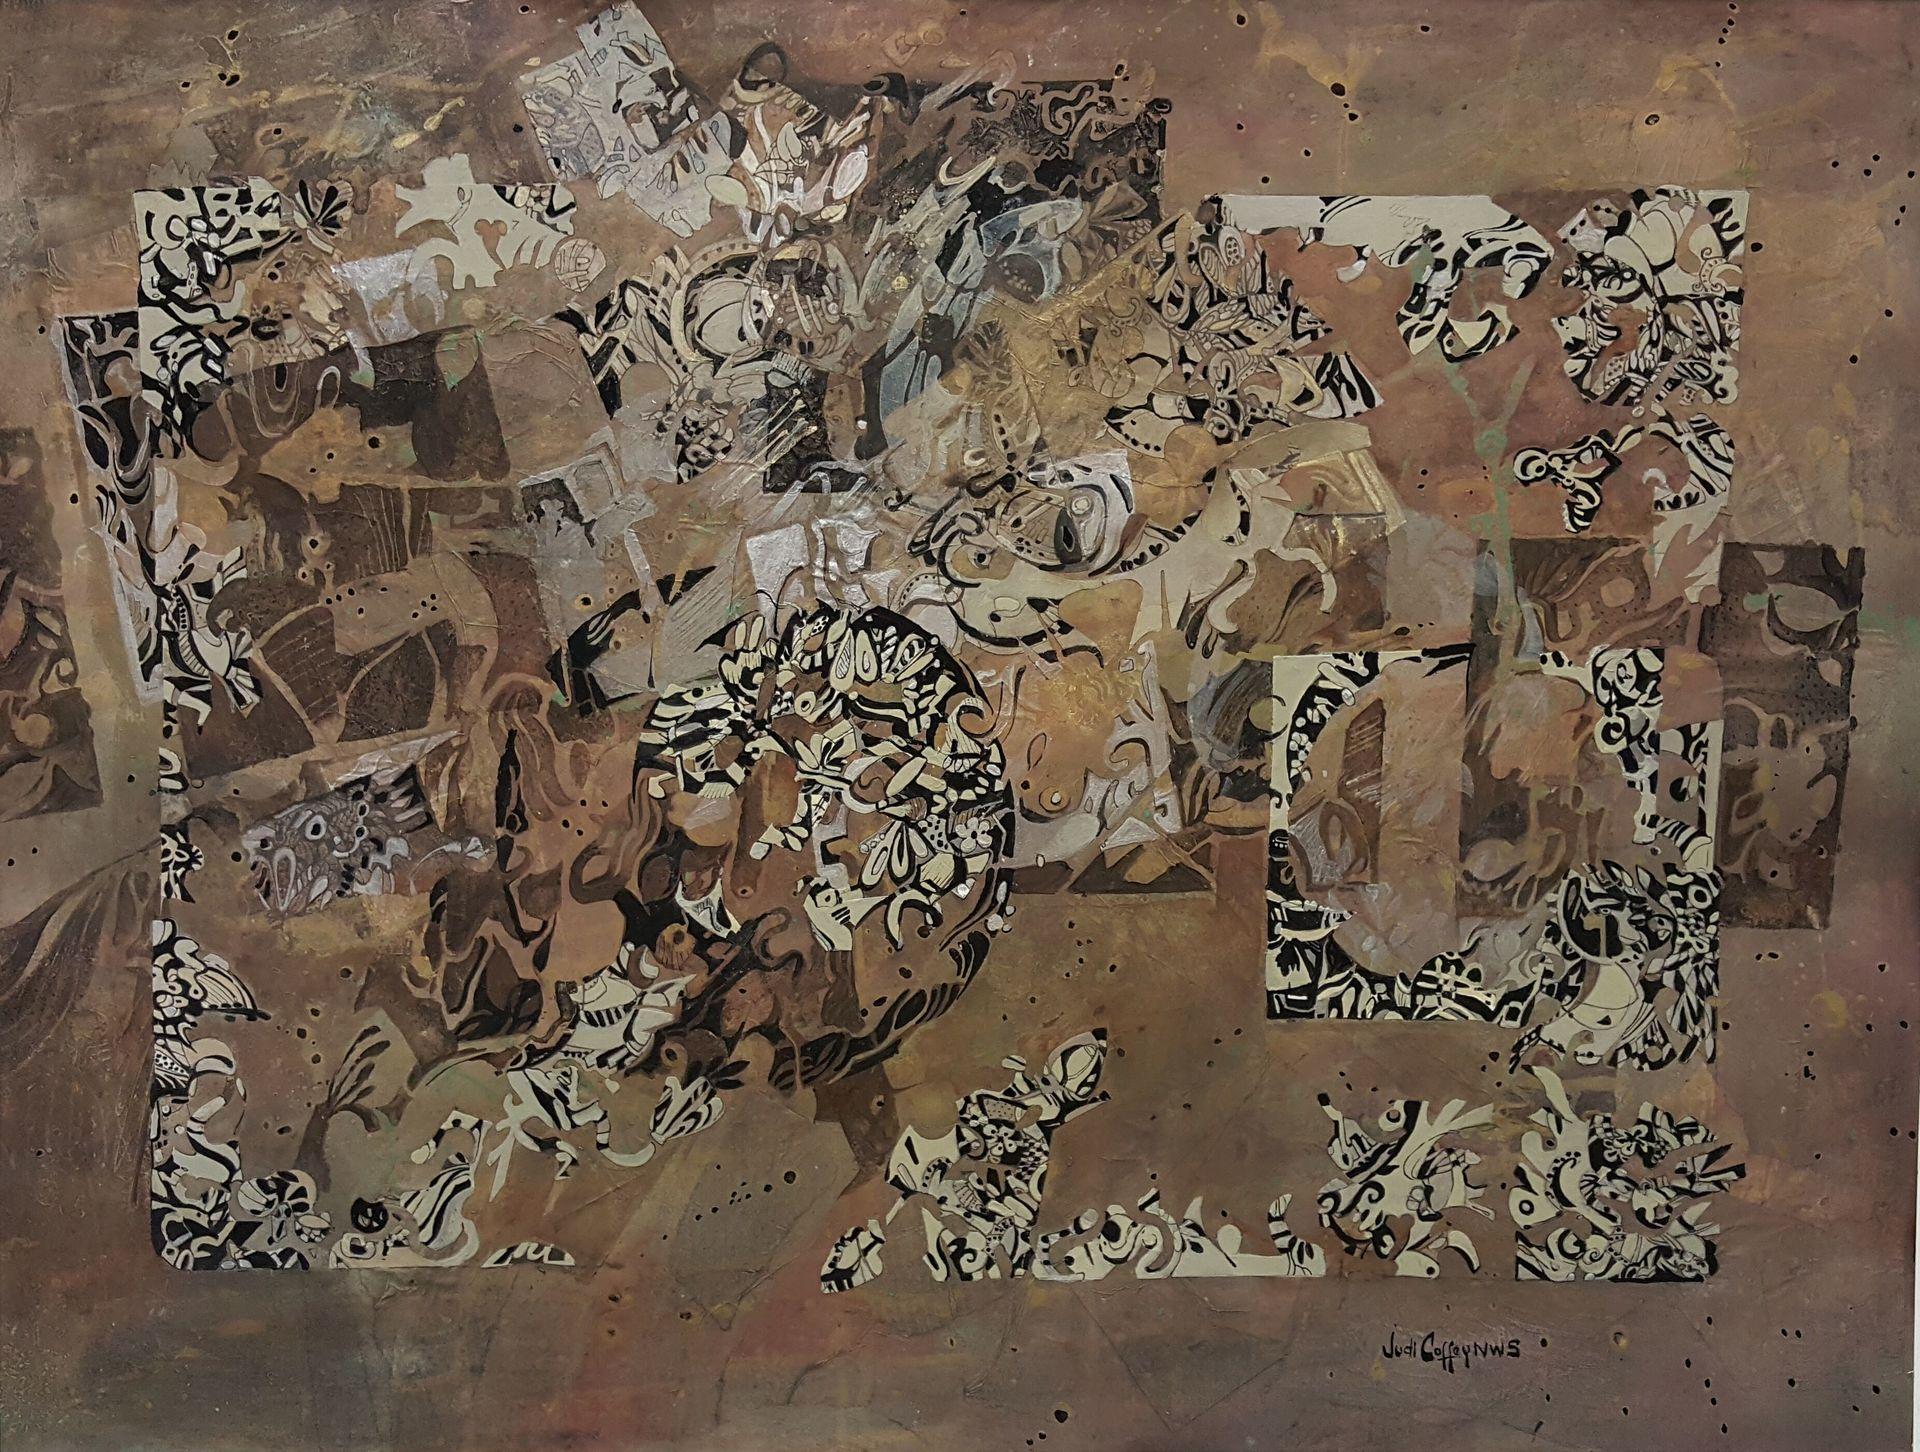 Judi Coffey, Fragments